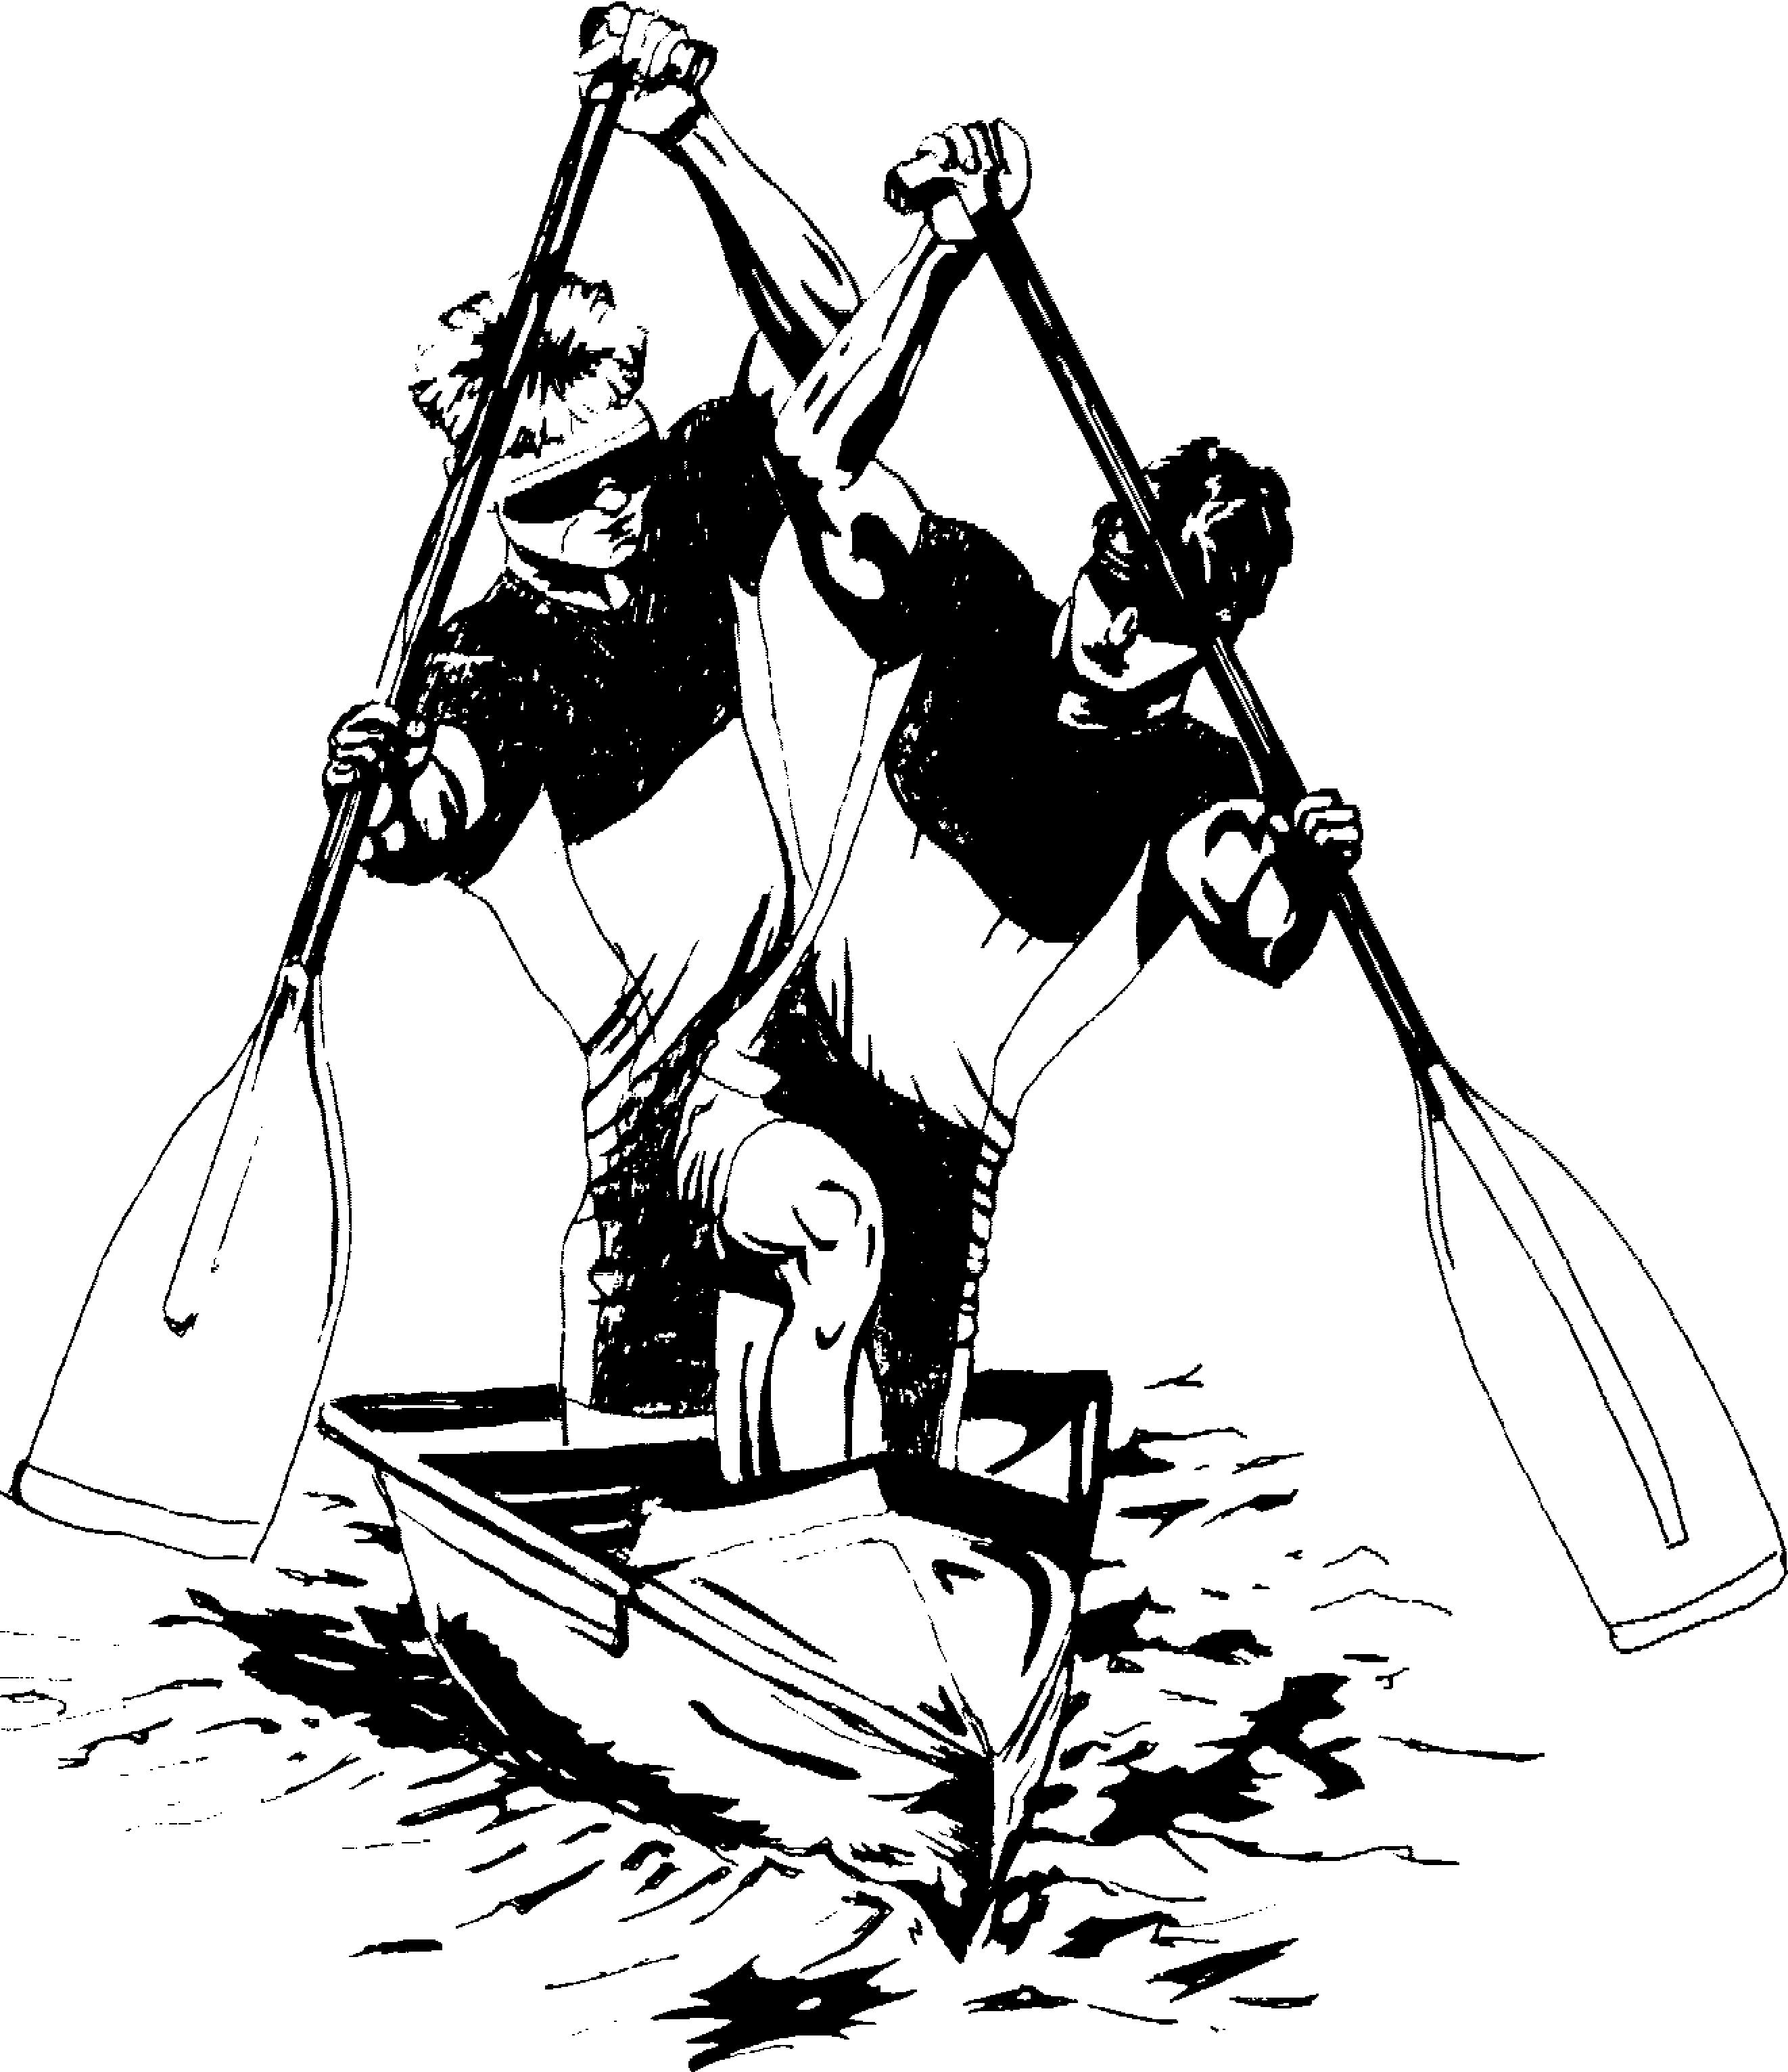 Рисунки гребля на байдарках и каноэ